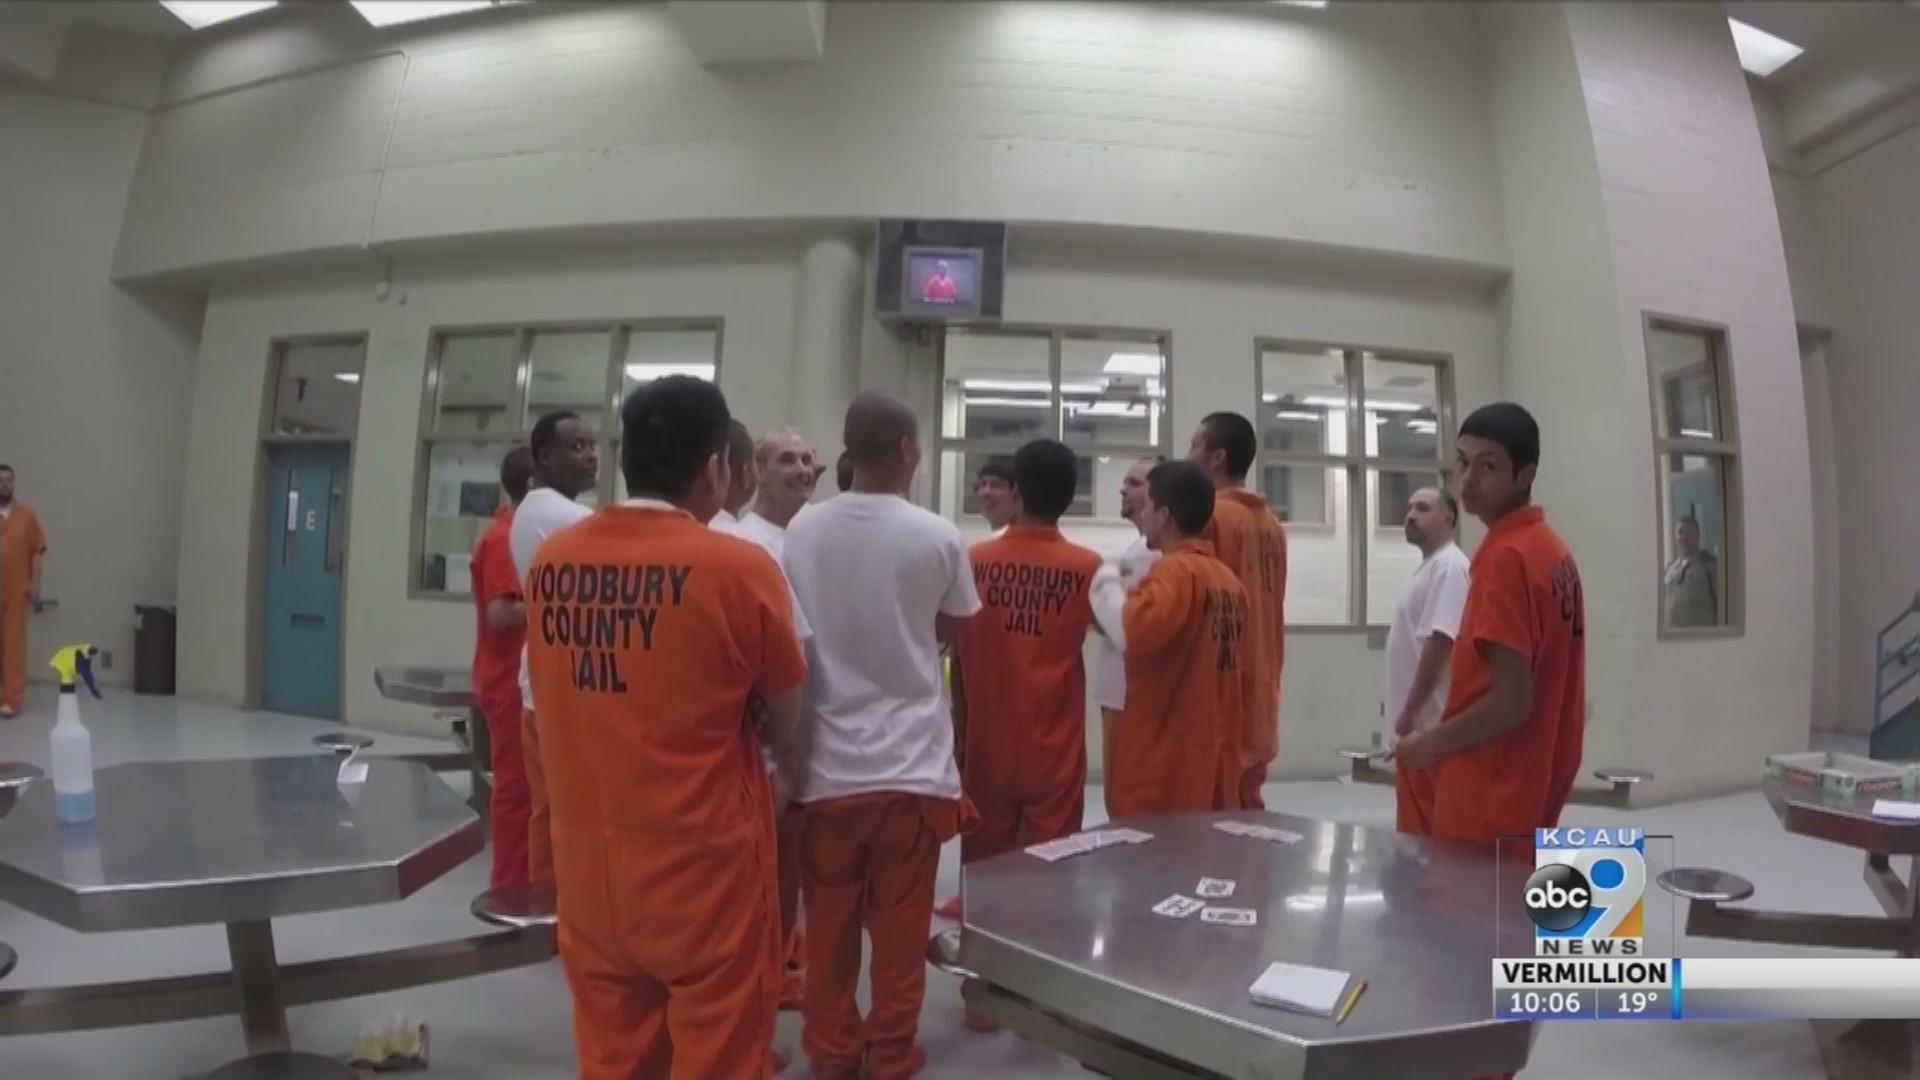 Iowa prison population has tripled